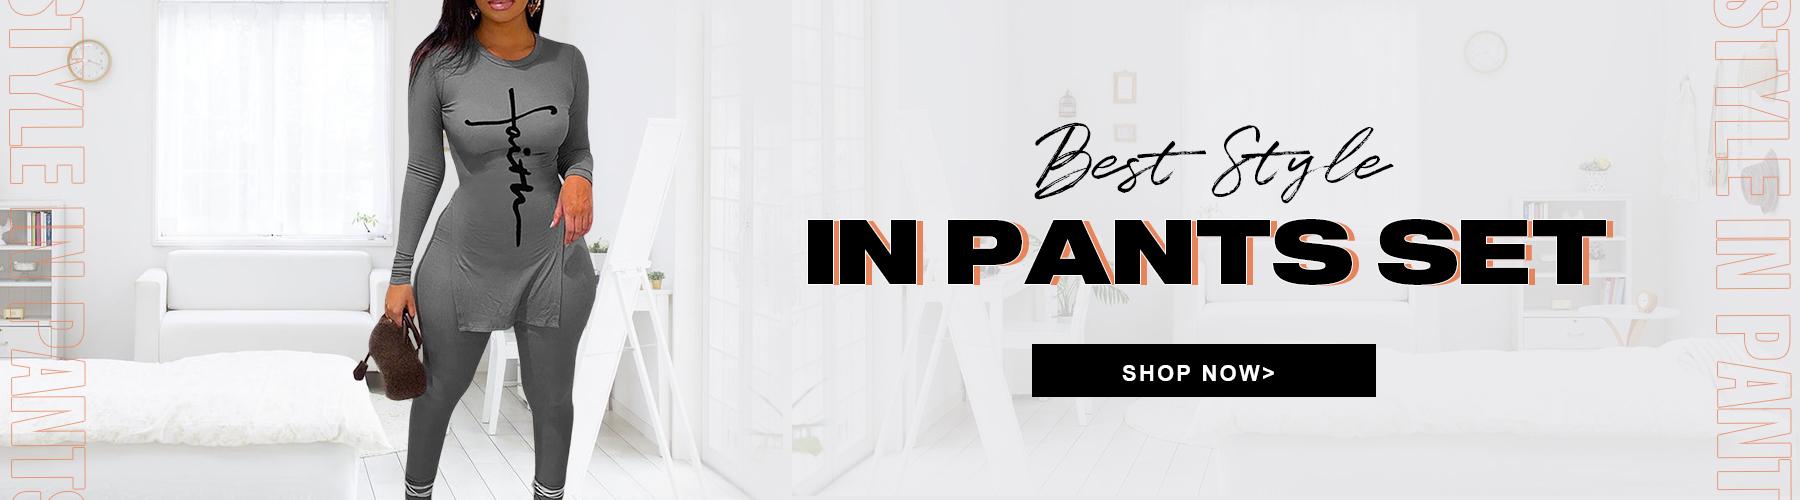 Best Style In Pants Set